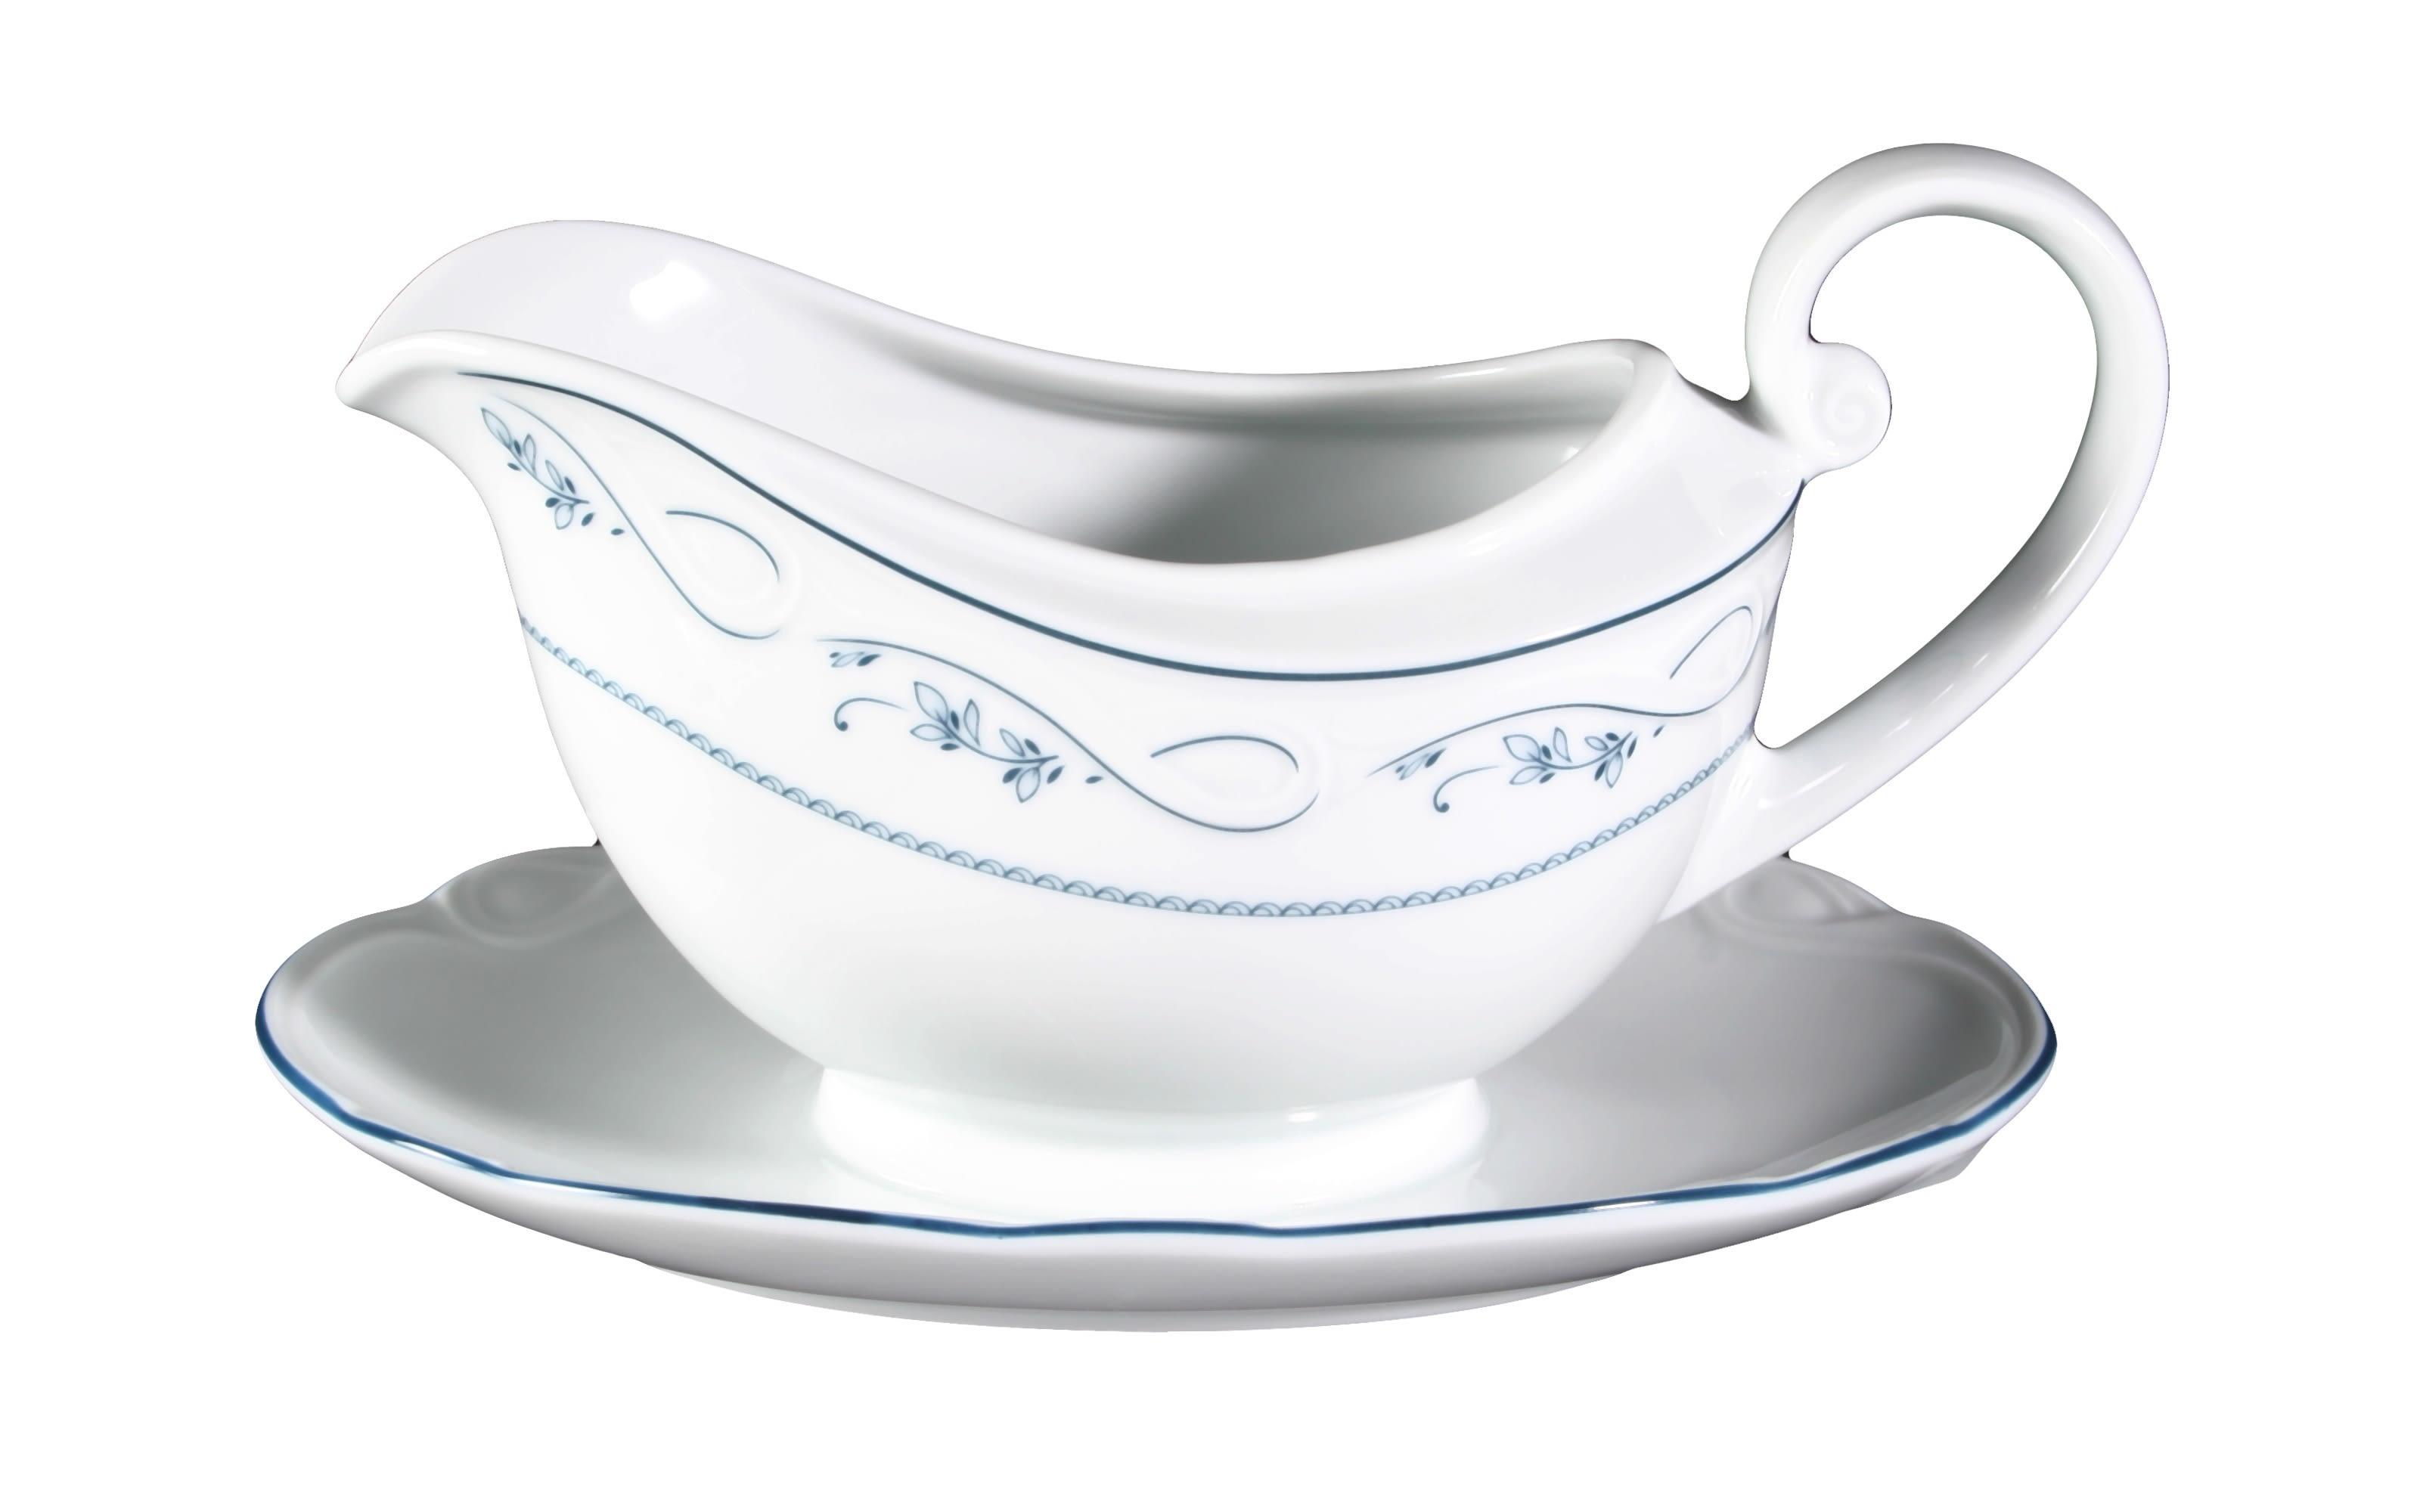 Sauciere Desiree Aalborg in weiß, 0,45 l